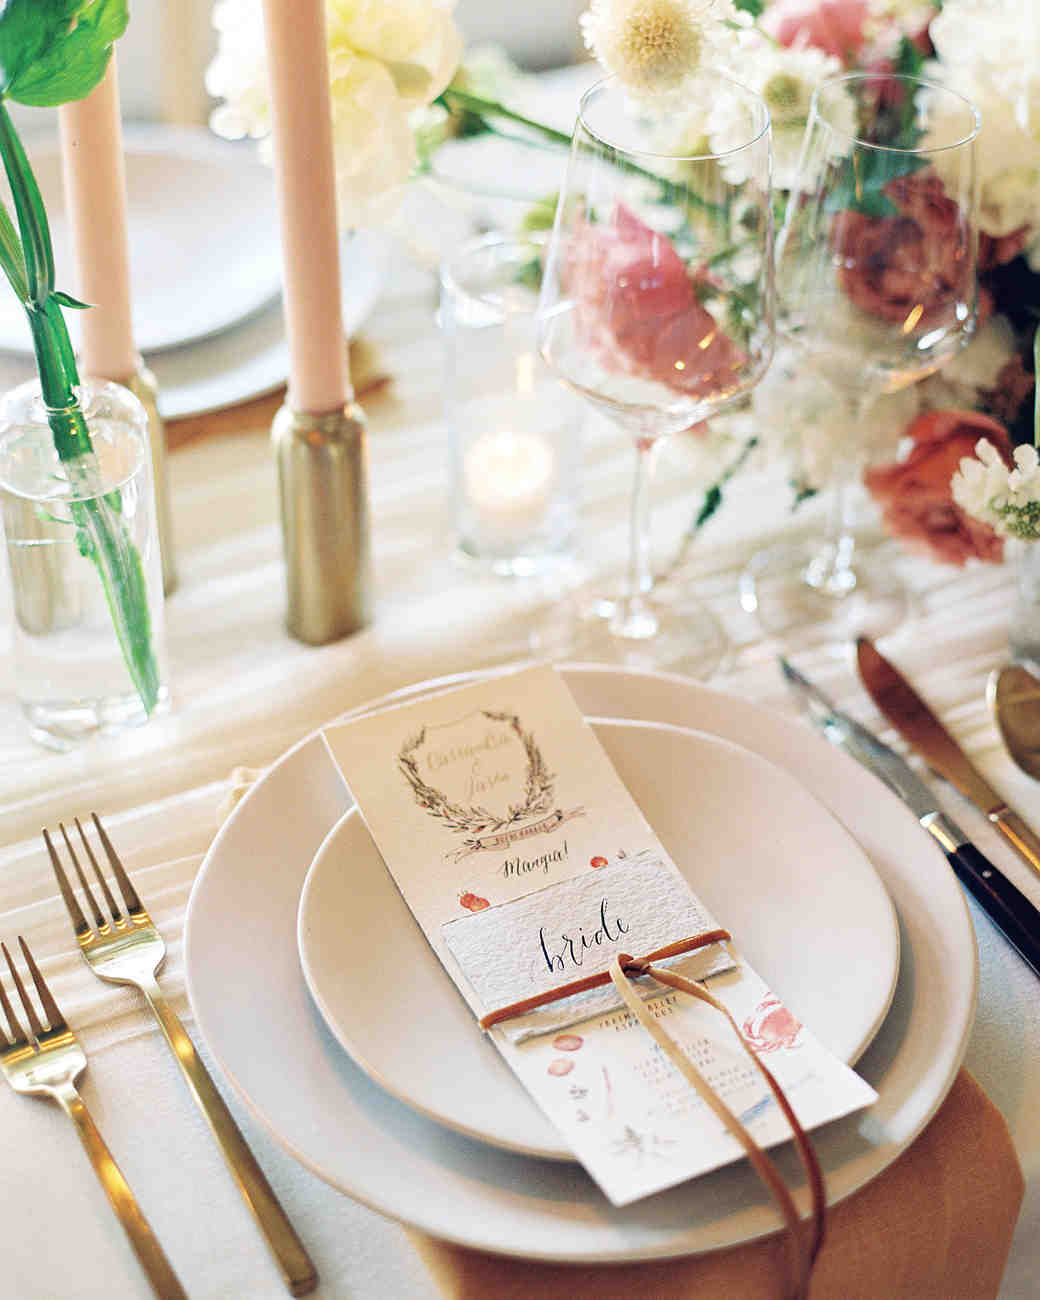 cassandra jason wedding place setting